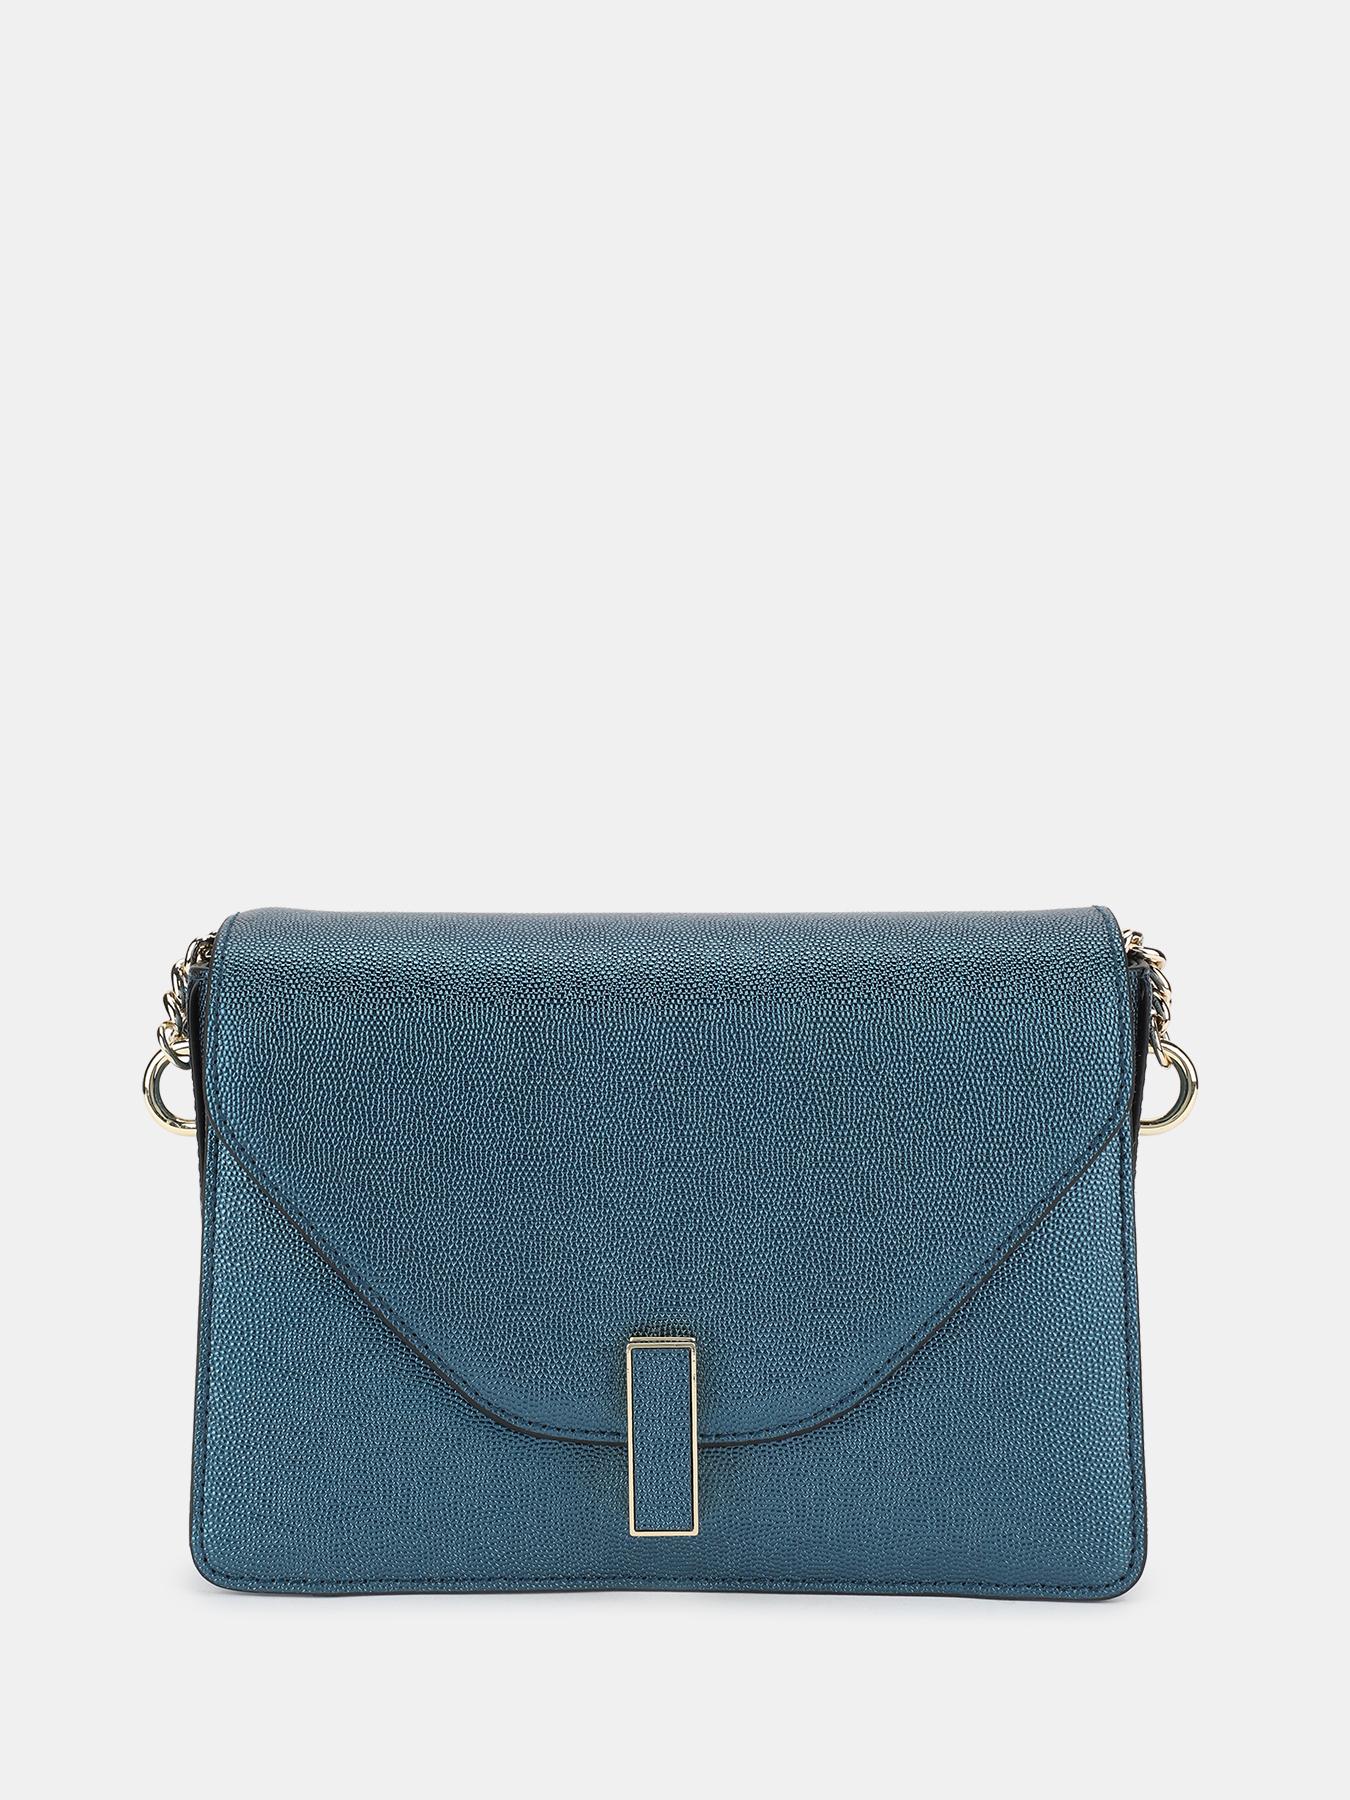 Фото - Сумки через плечо Alessandro Manzoni Женская сумка женская сумка grey 24645554